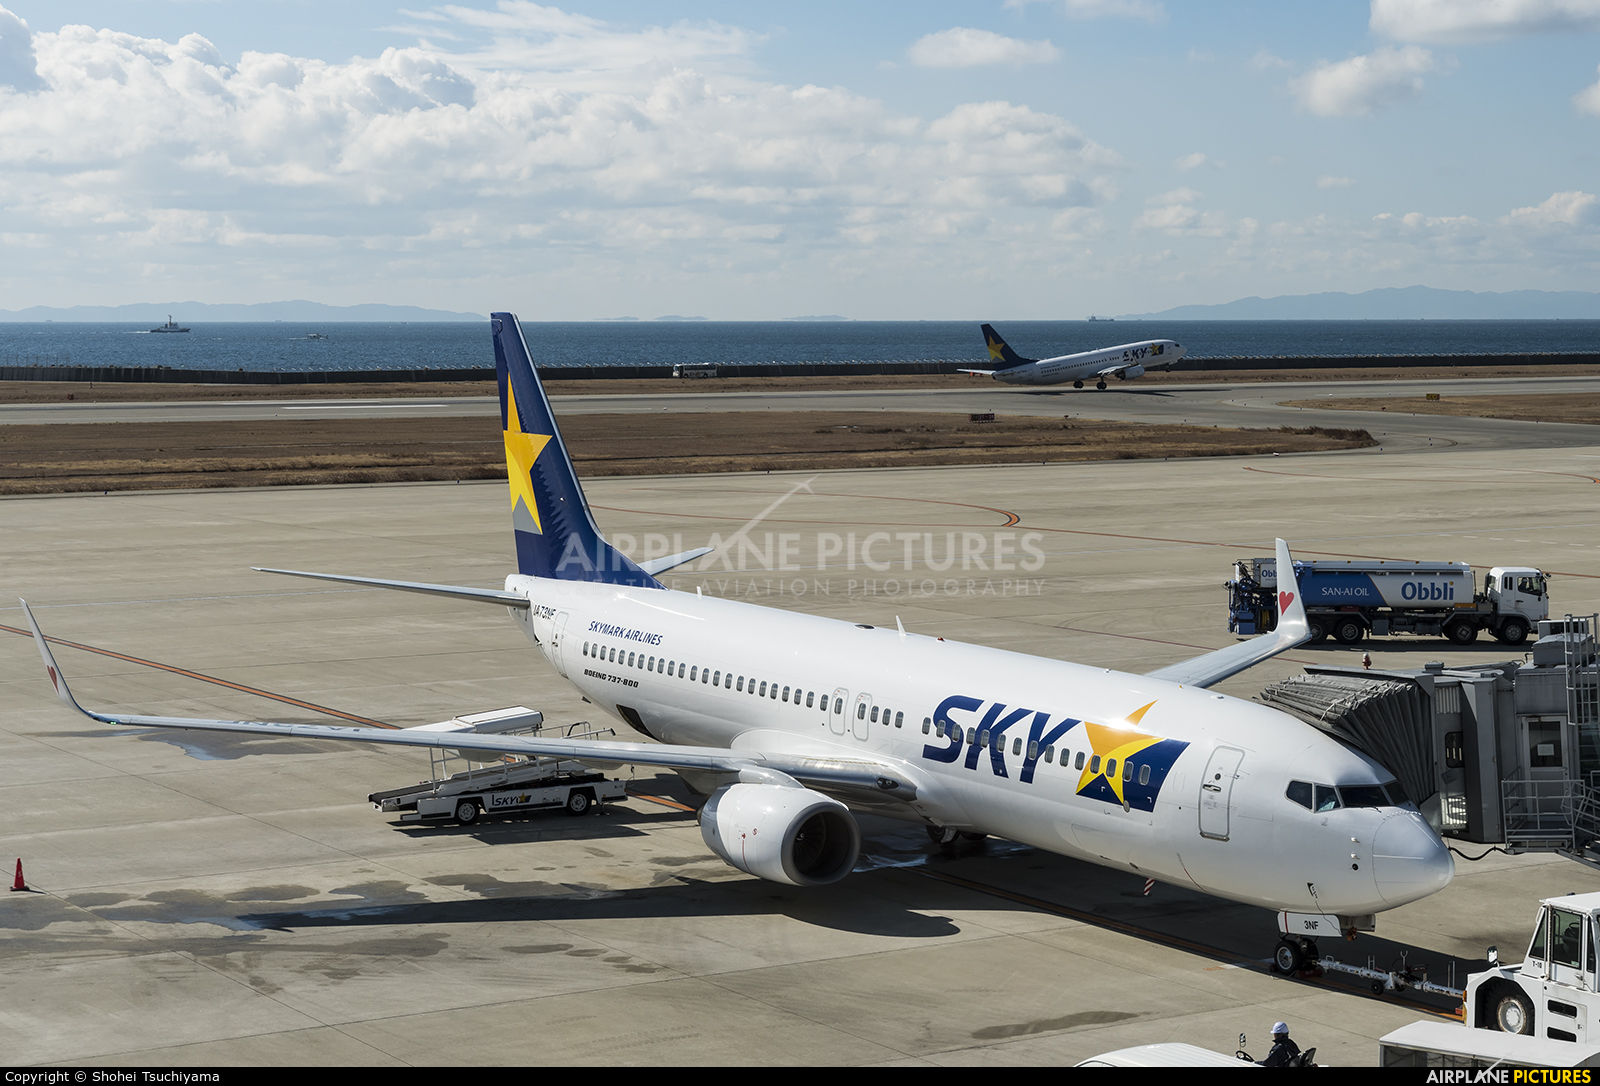 Skymark Airlines JA73NF aircraft at Kobe